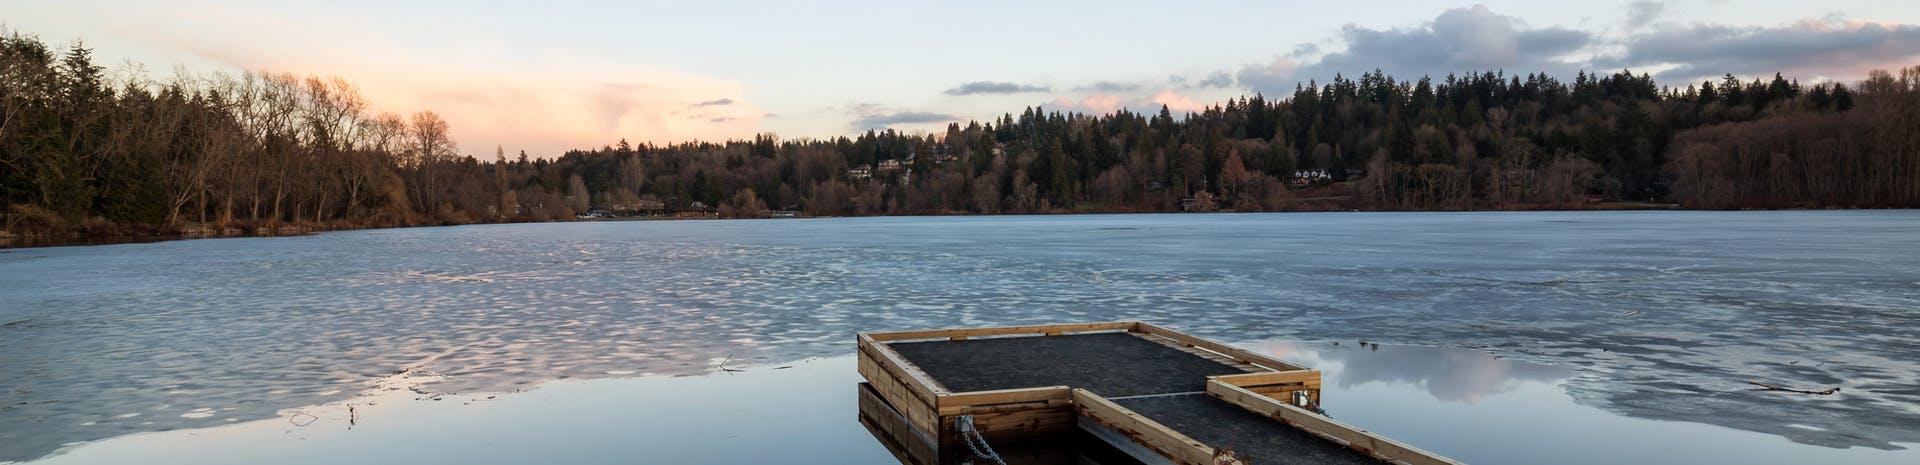 Picture of Deer Lake